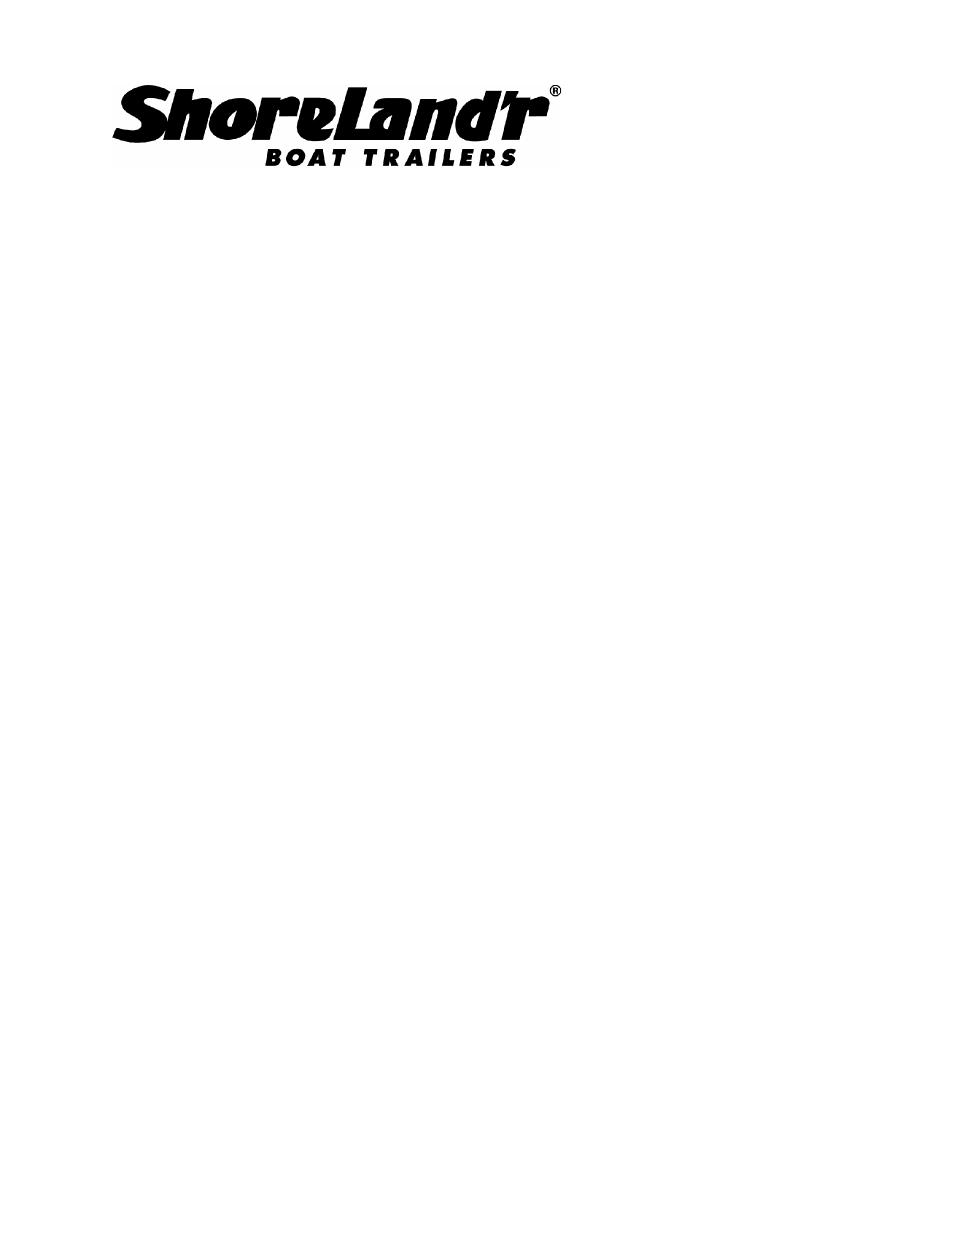 Shorelandr Sdv1831b User Manual 4 Pages Shorelander Wiring Harness Background Image